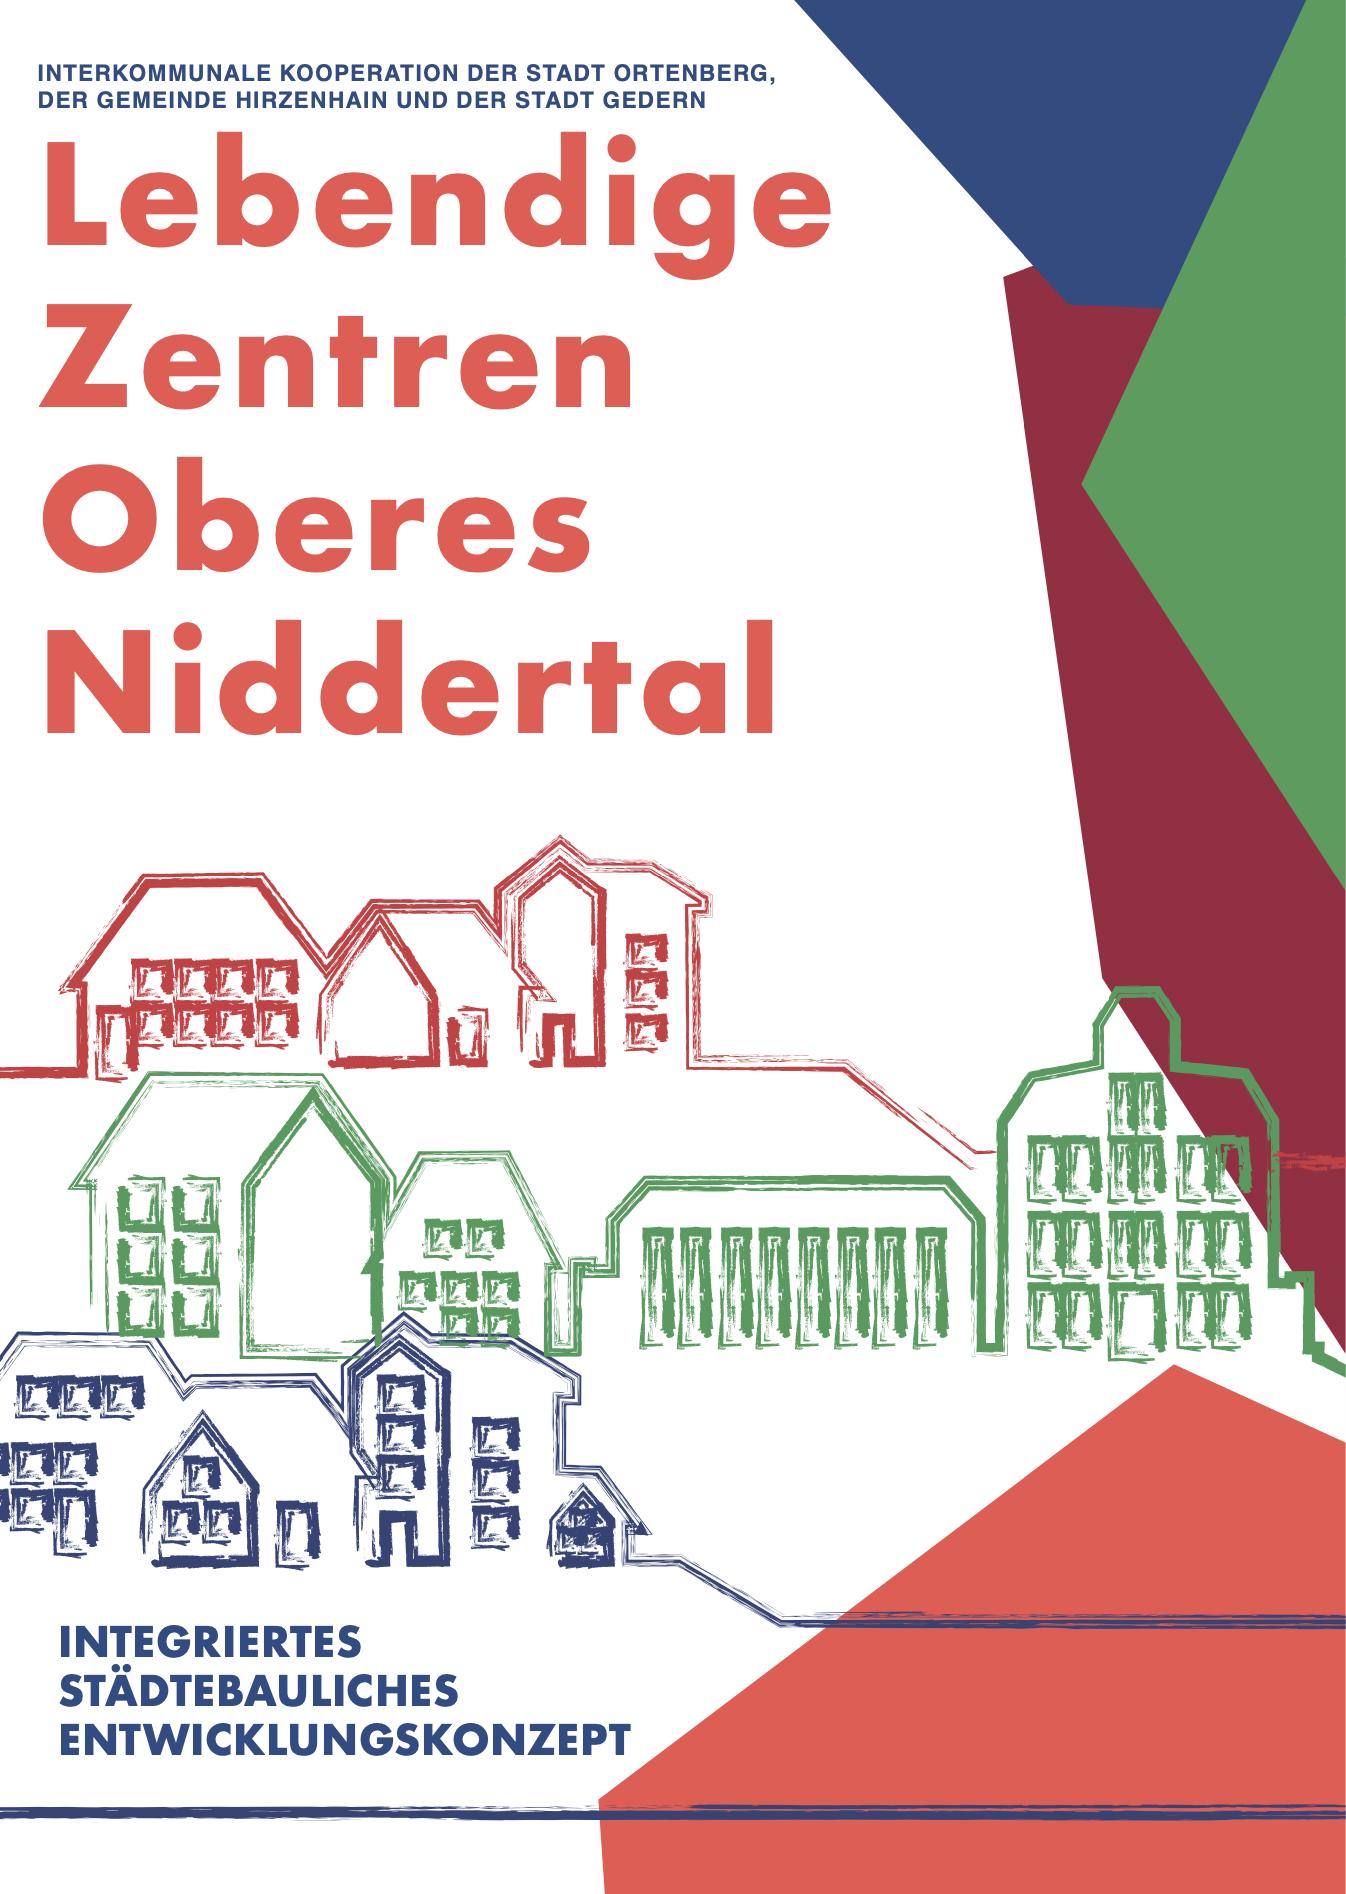 Lebendige Zentren Oberes Niddertal